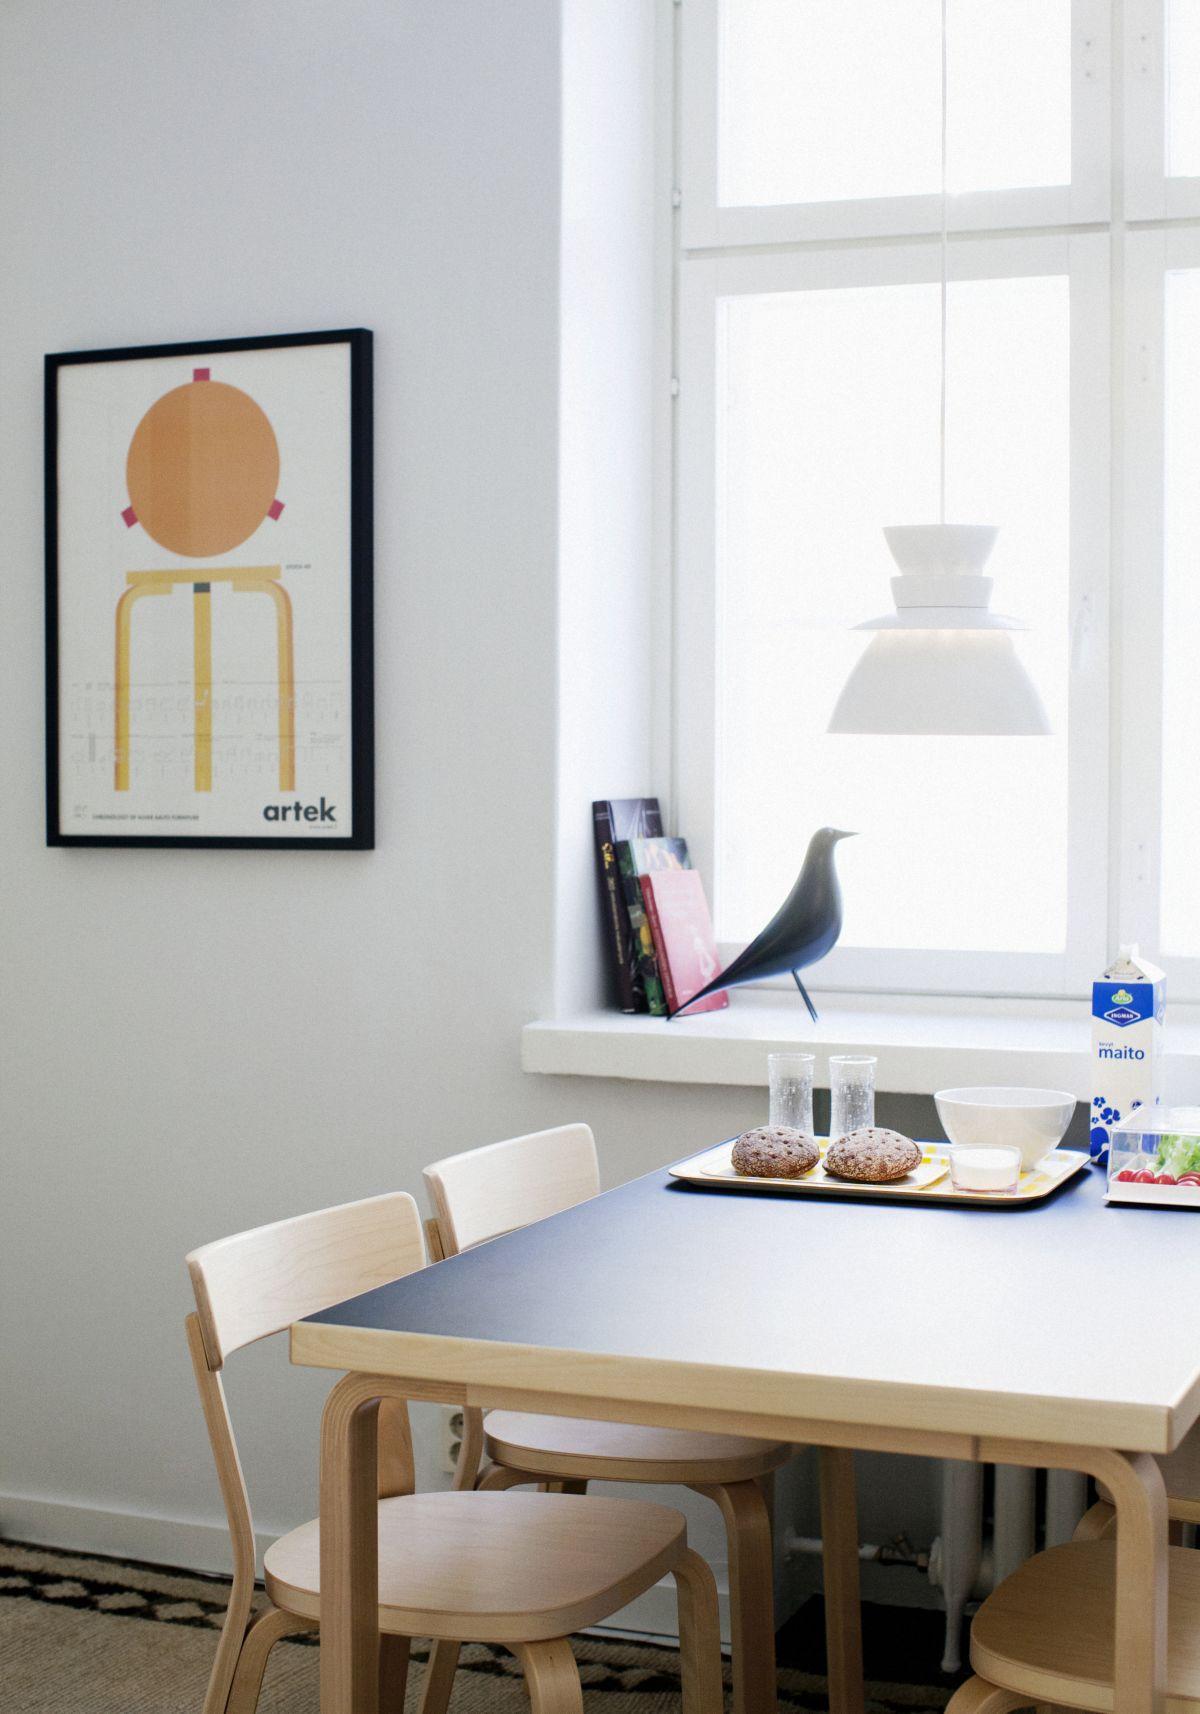 Chair 69 Aalto Table rectangular 81B Aalto Chronology Poster_2